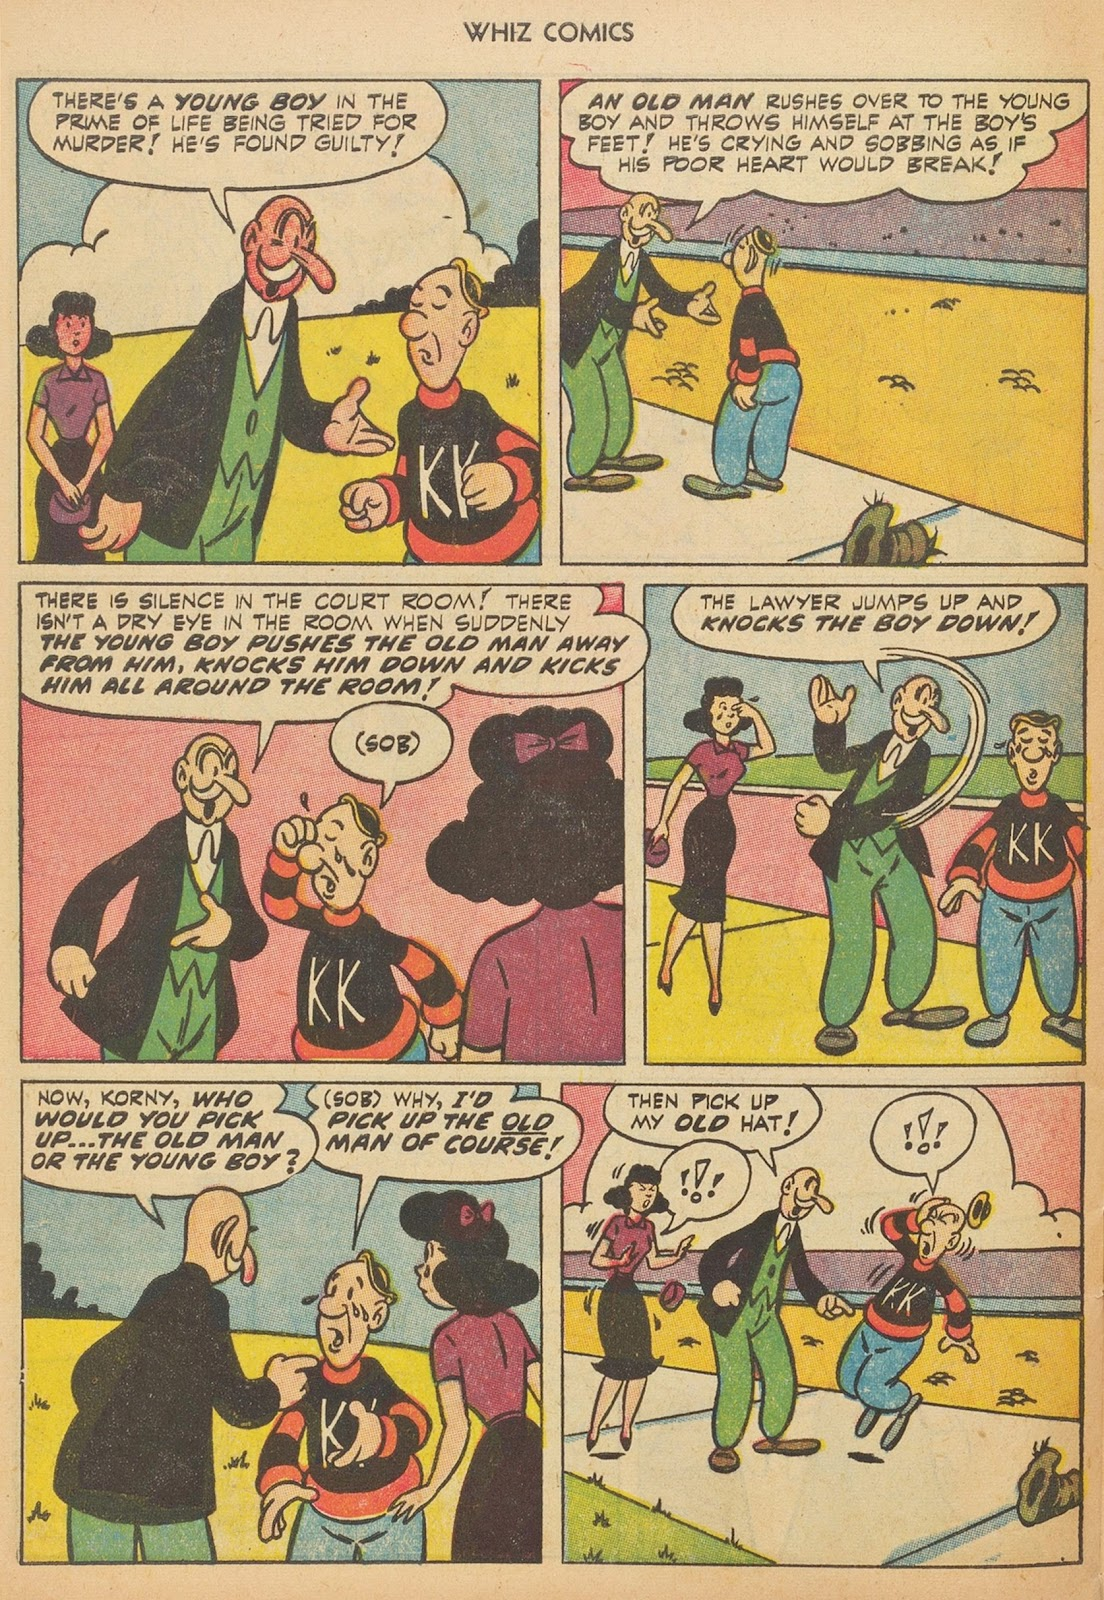 Read online WHIZ Comics comic -  Issue #153 - 28